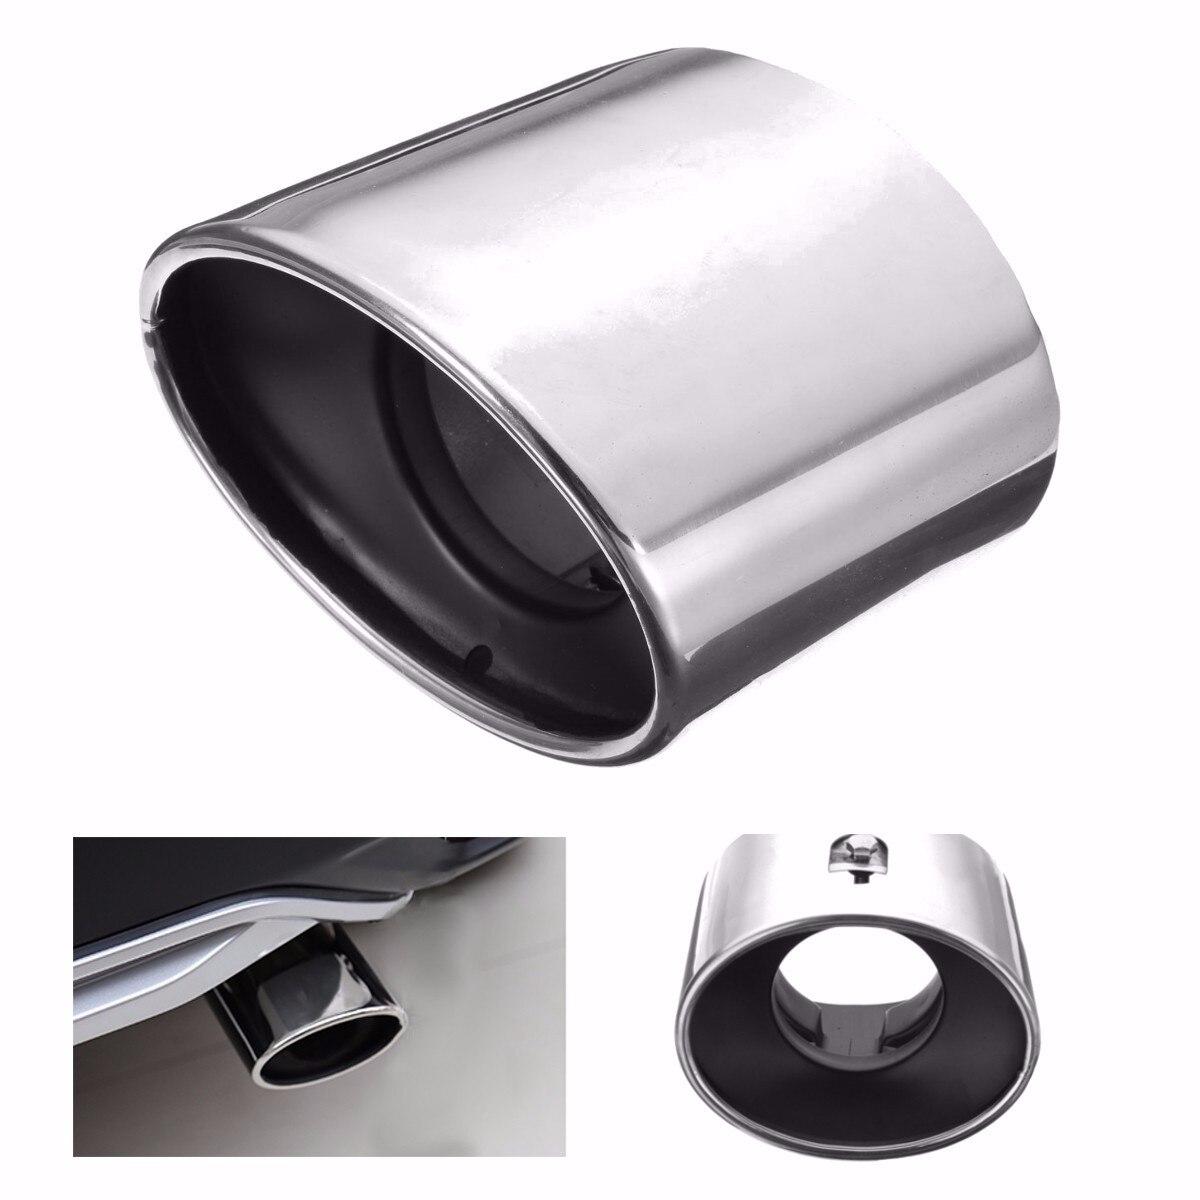 Cromo acero inoxidable de escape silenciador de tubo de cola para Honda/Accord 2008-2012